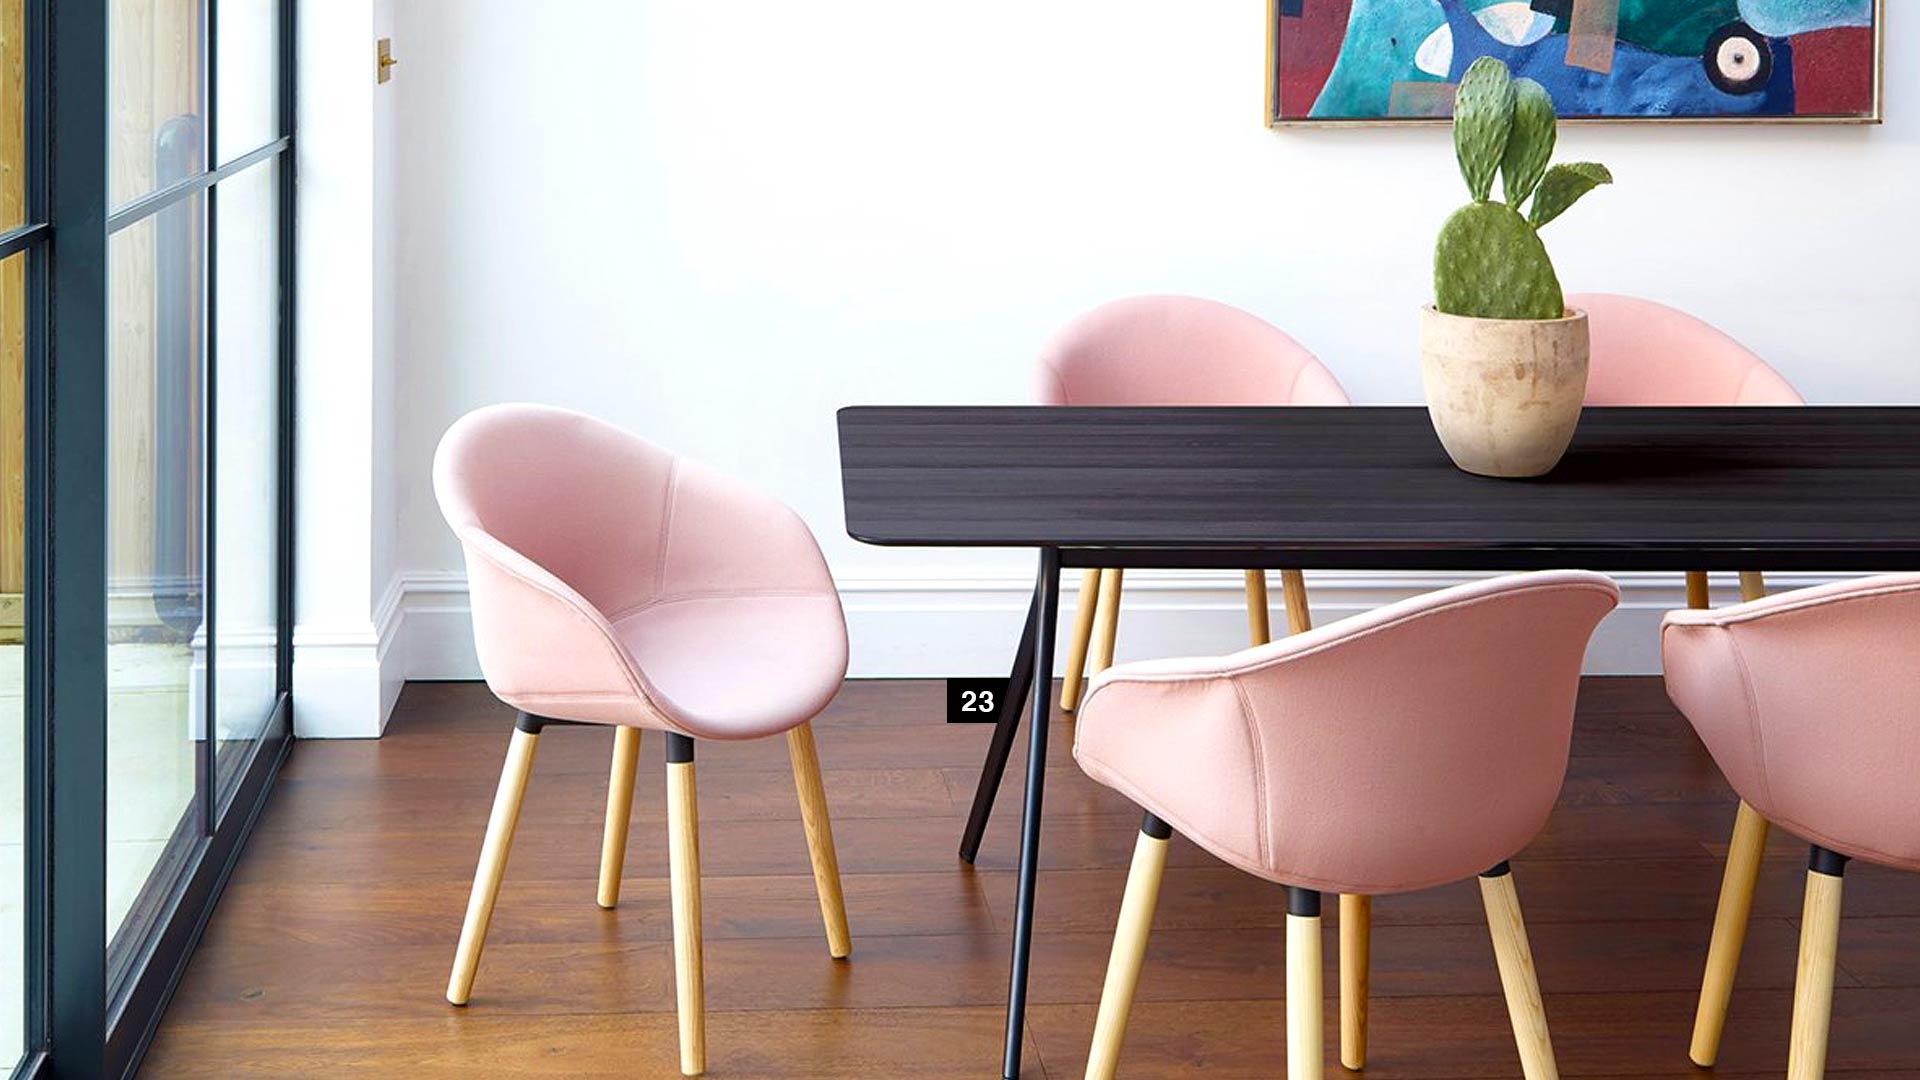 abstract-modern-furniture-allermuir-kin-chair-1